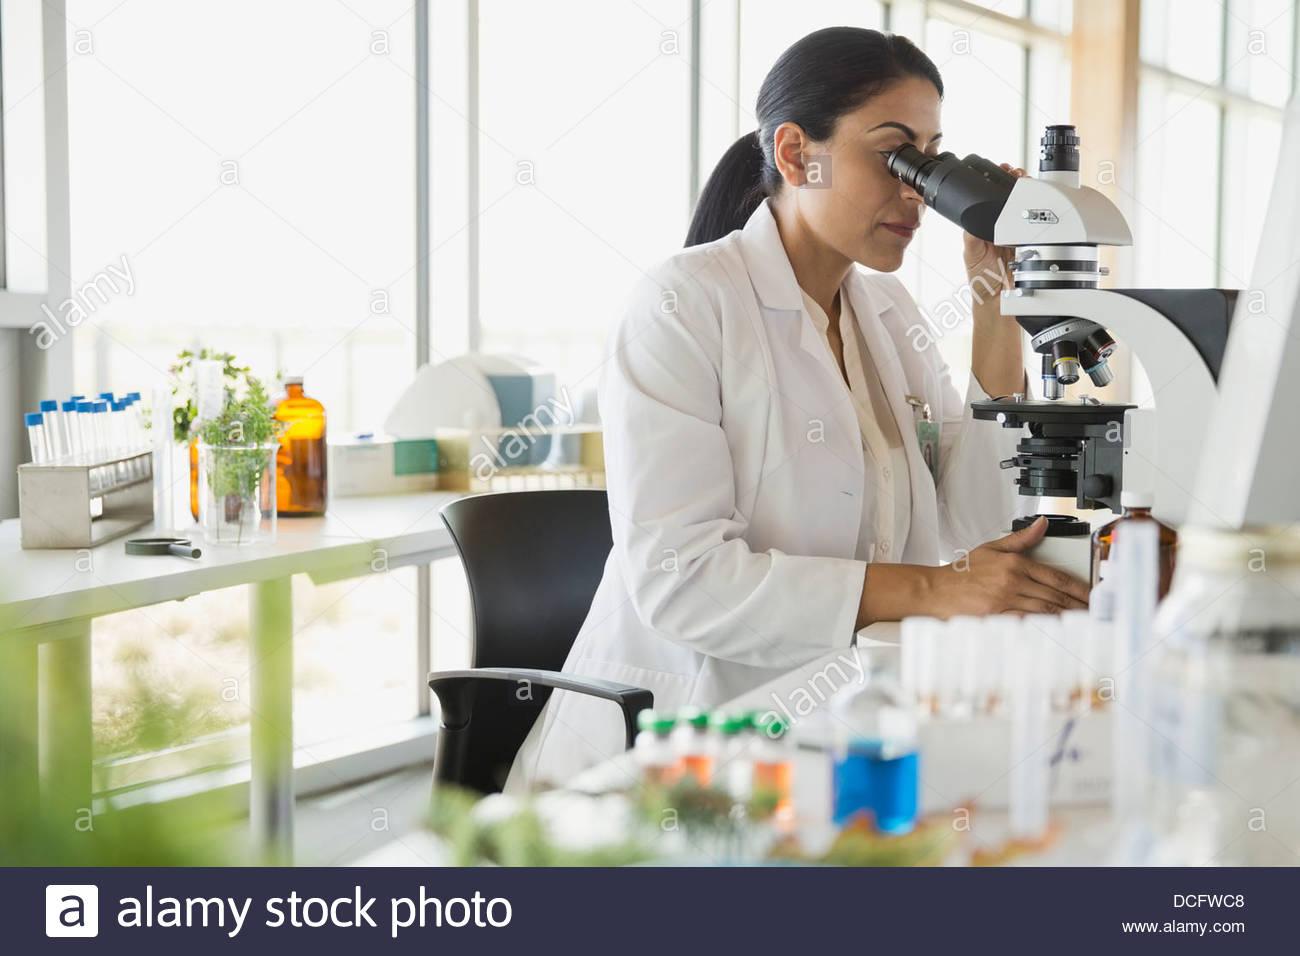 Botanist looking through microscope - Stock Image